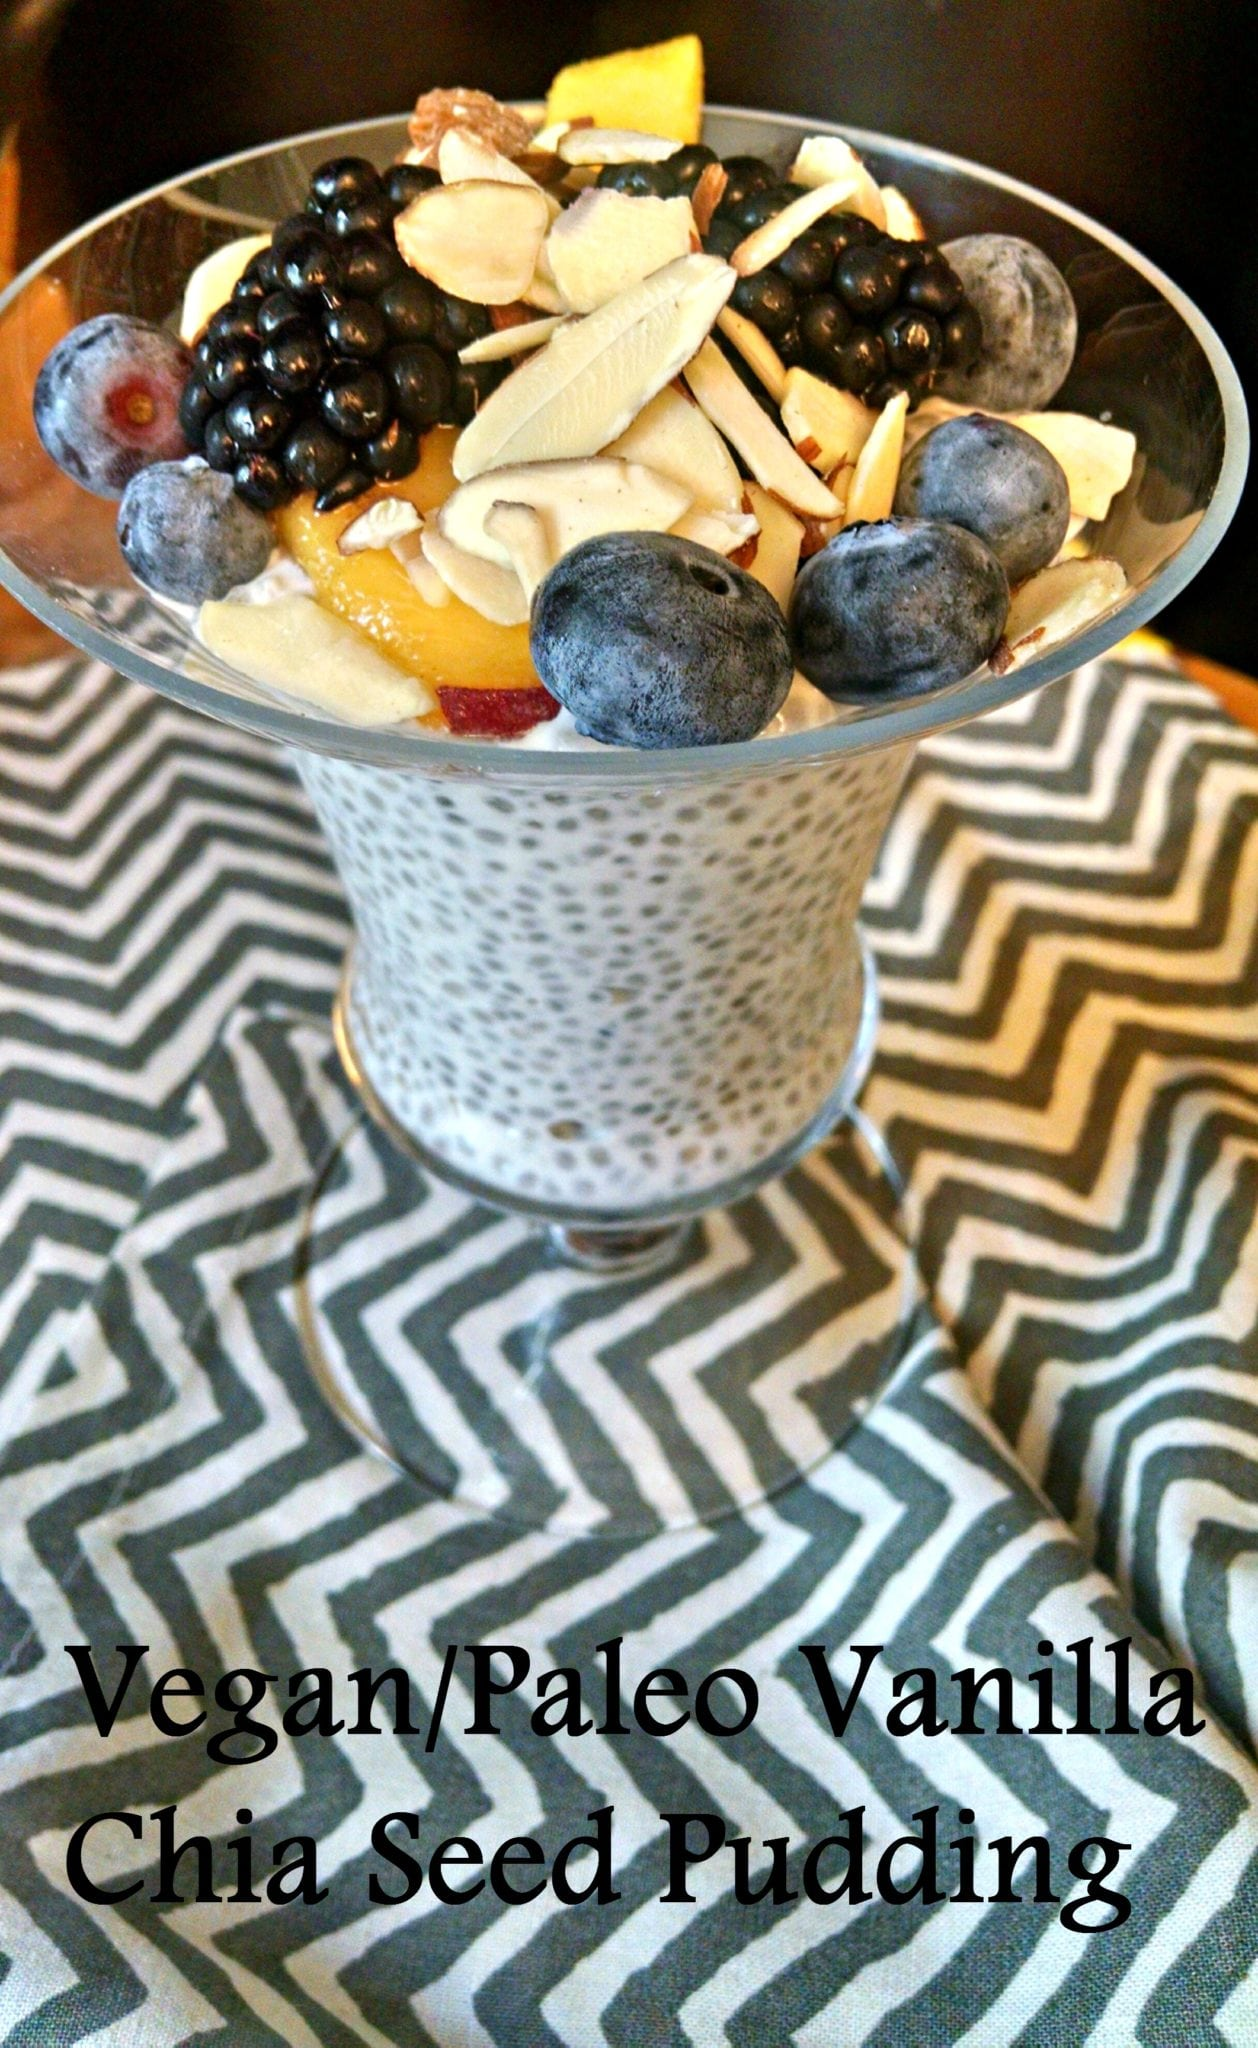 Vegan/Paleo Vanilla Chia Seed Pudding